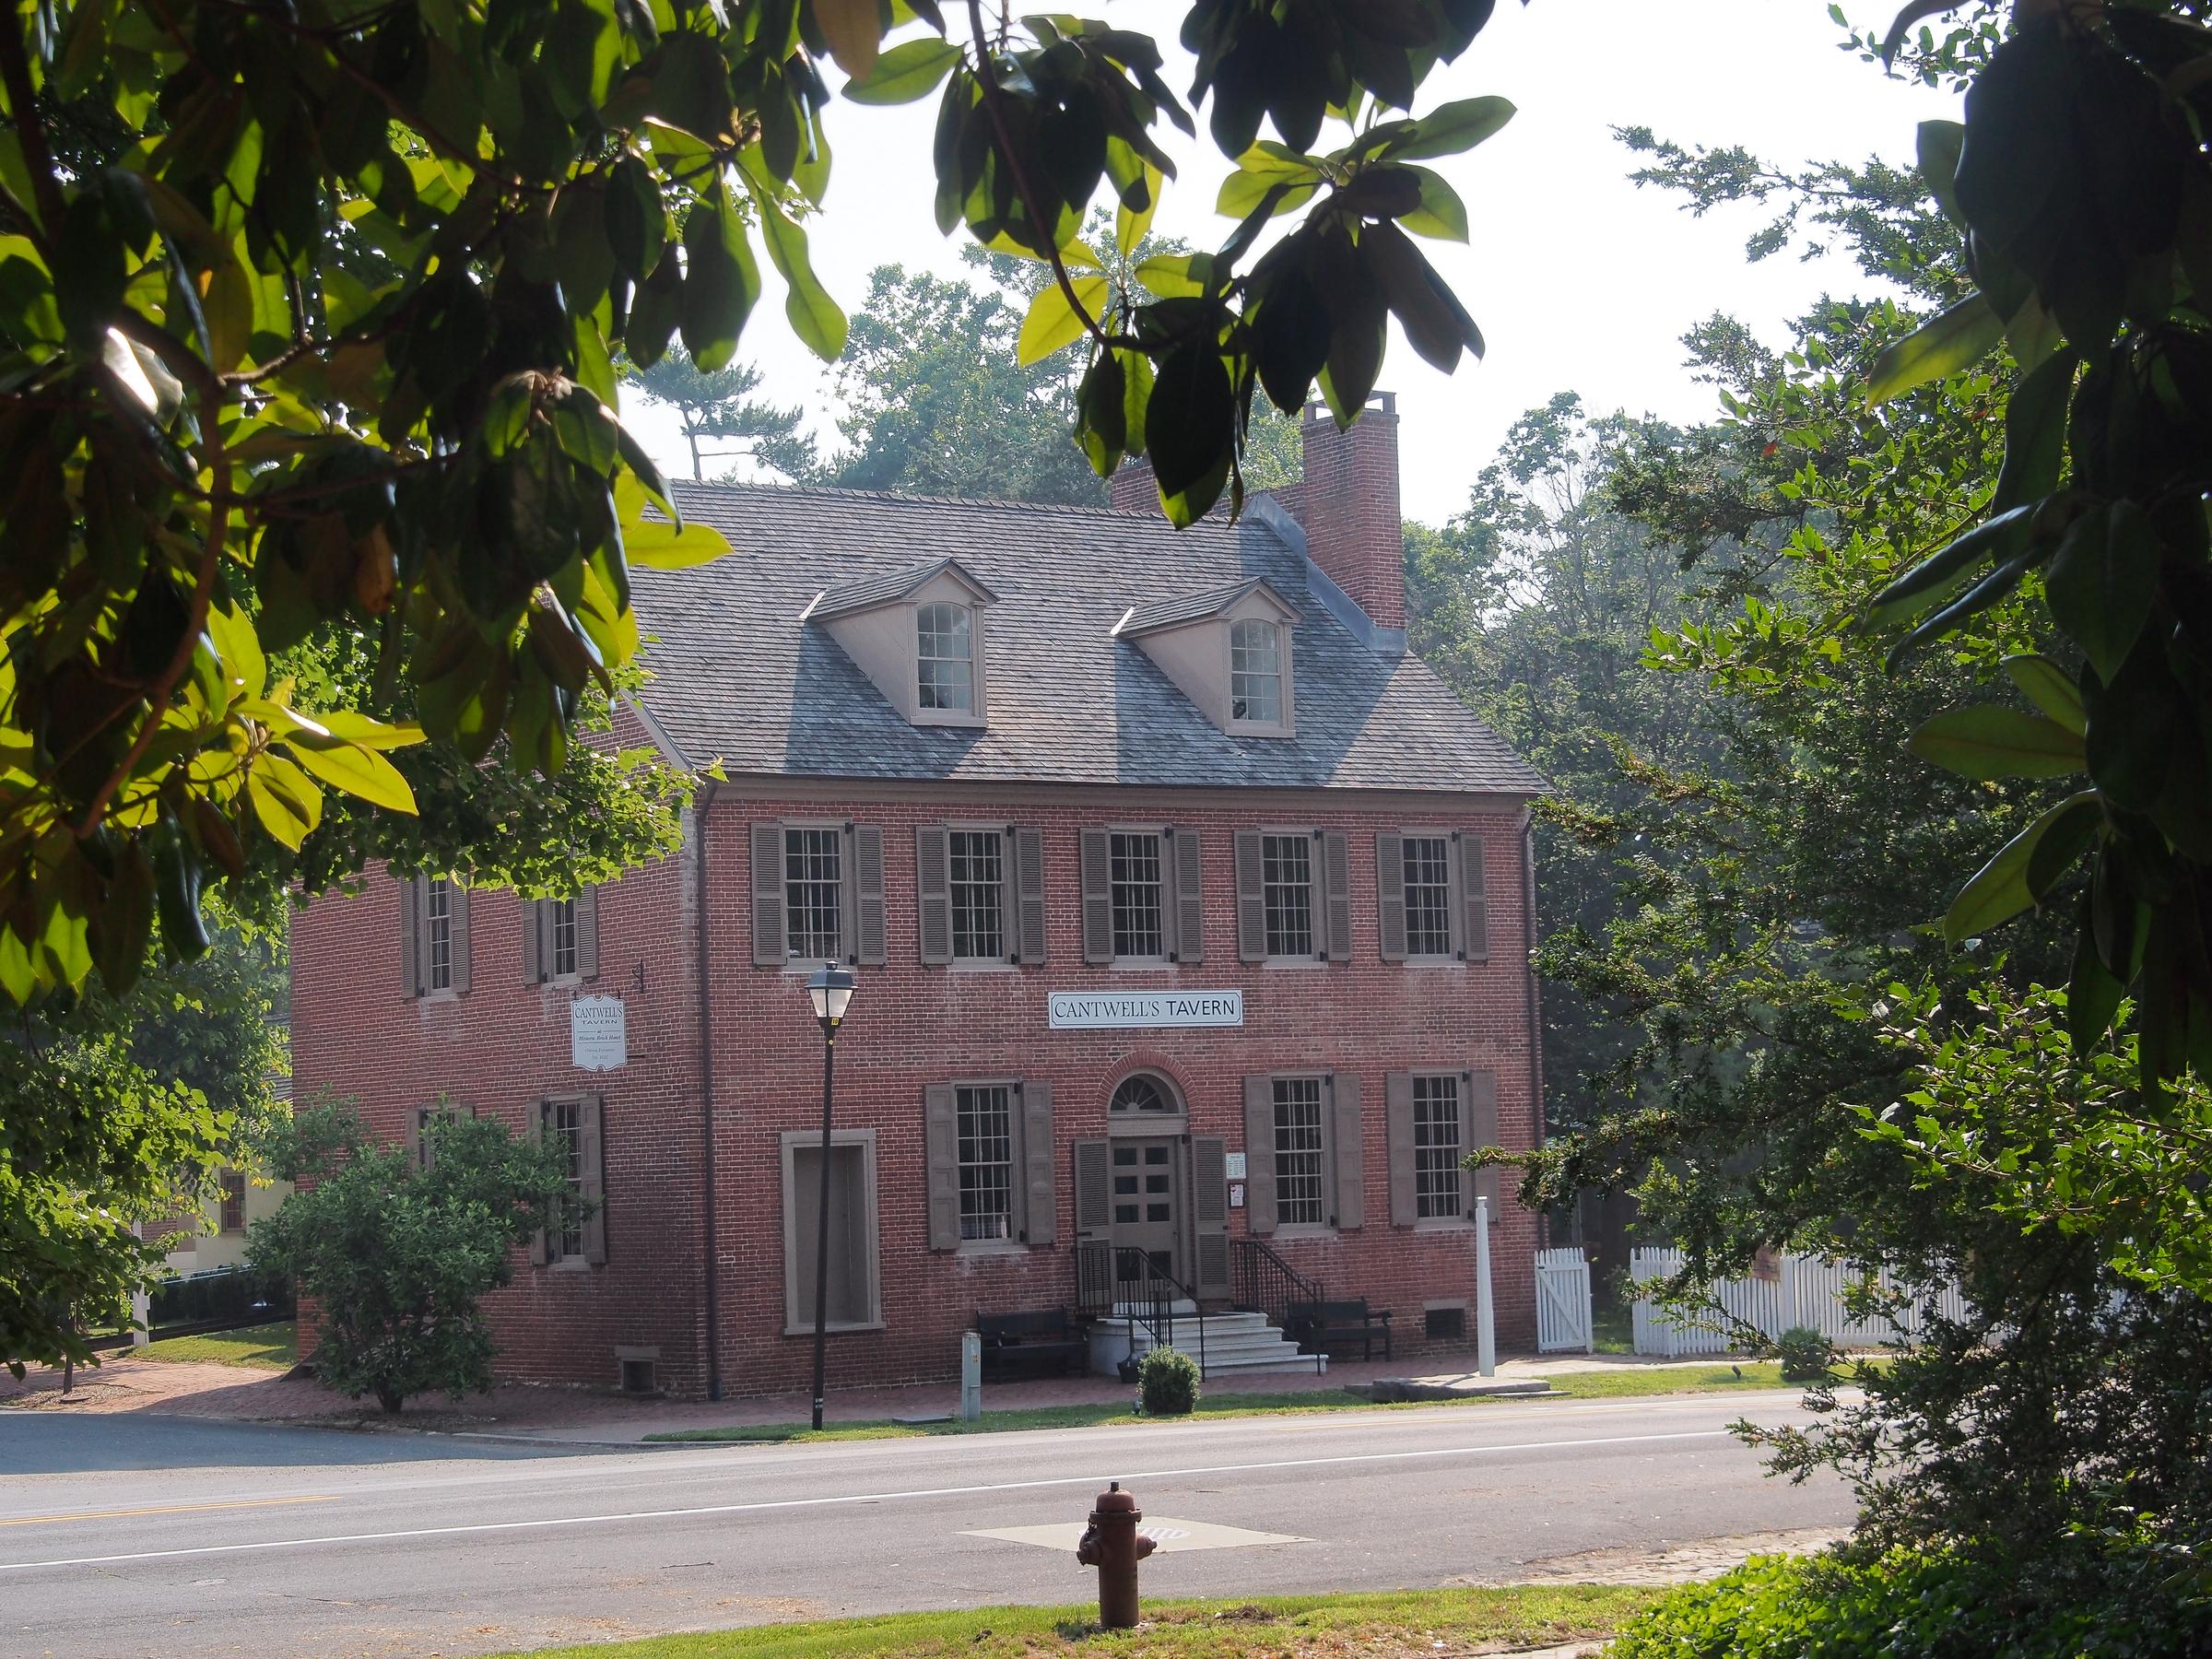 Cantwell's Tavern, Odessa, Delaware